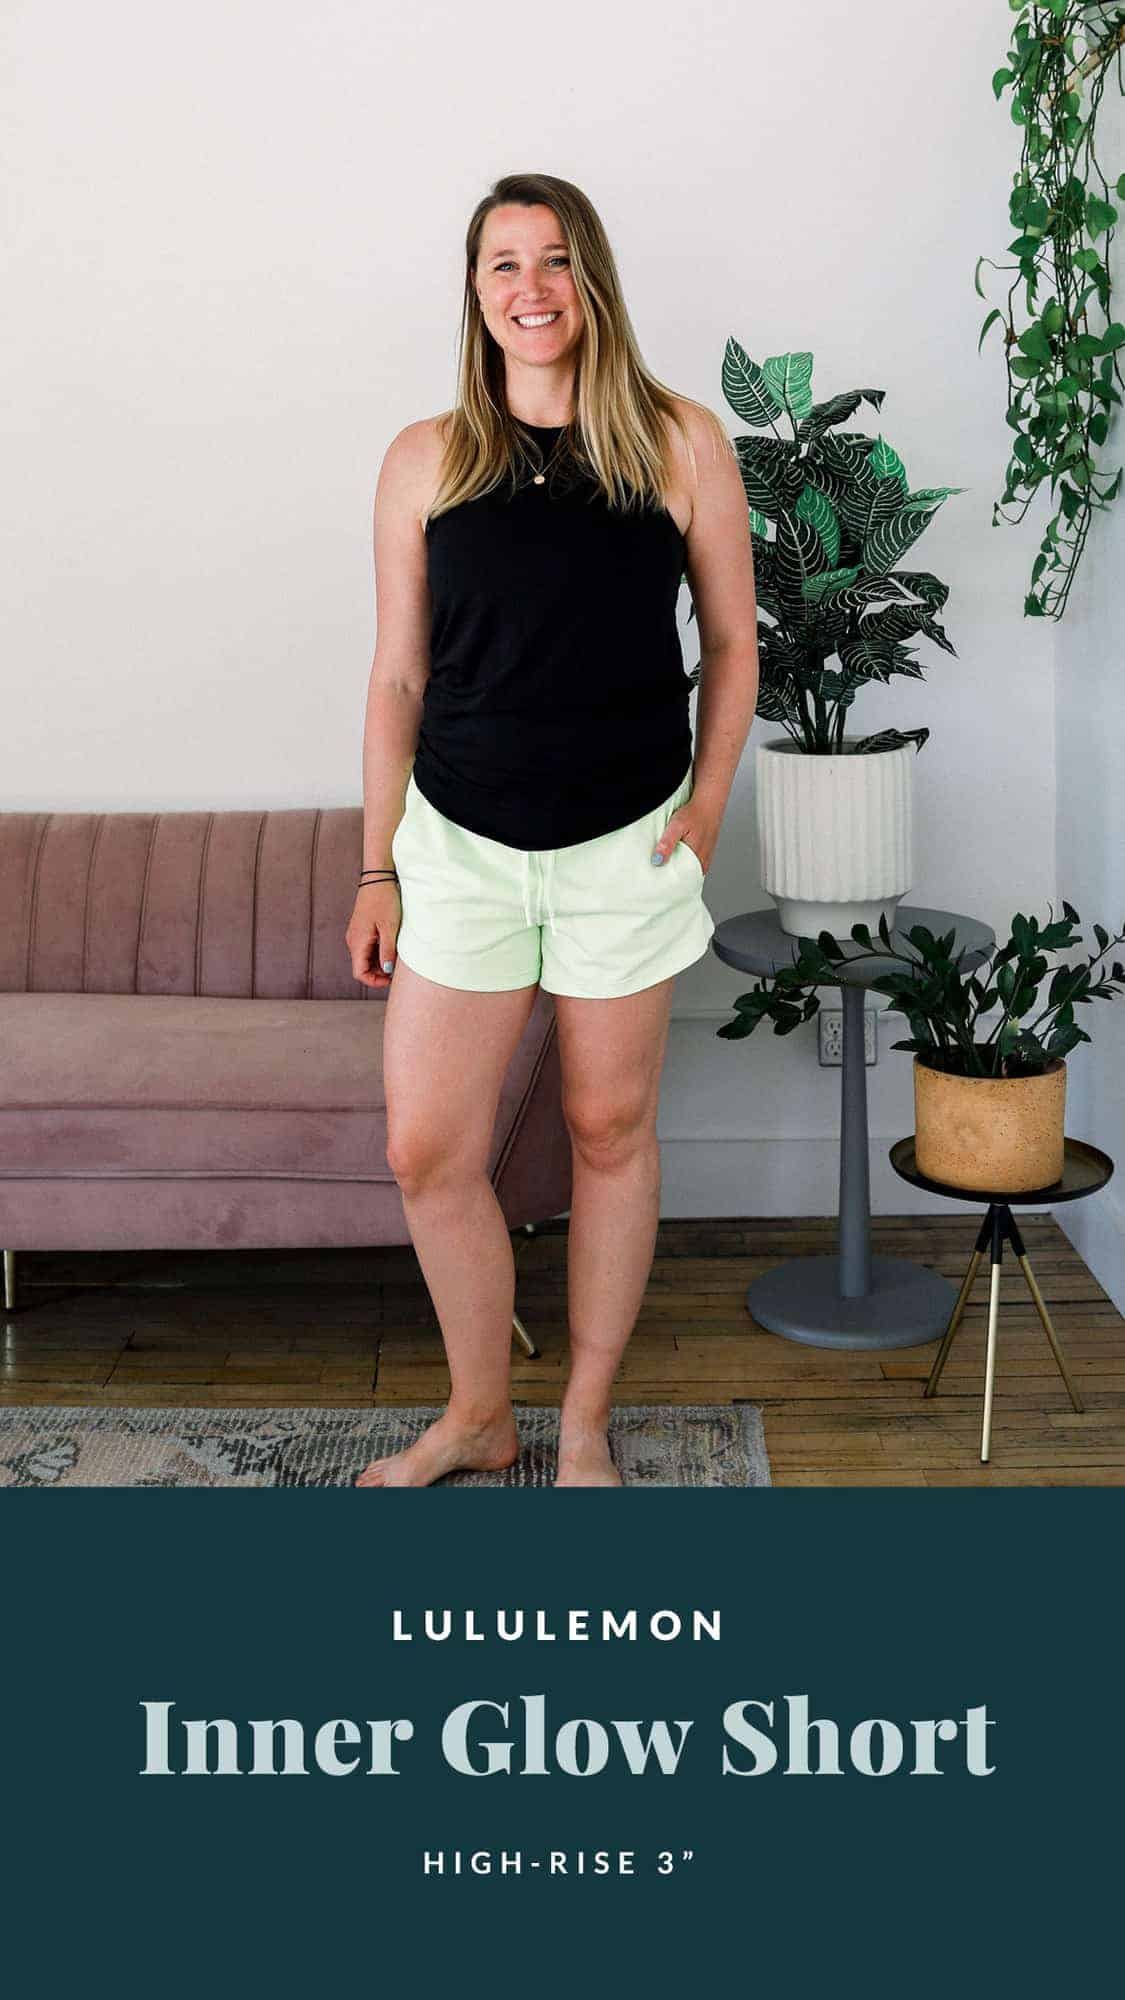 emily wearing the inner glow shorts by lululemon